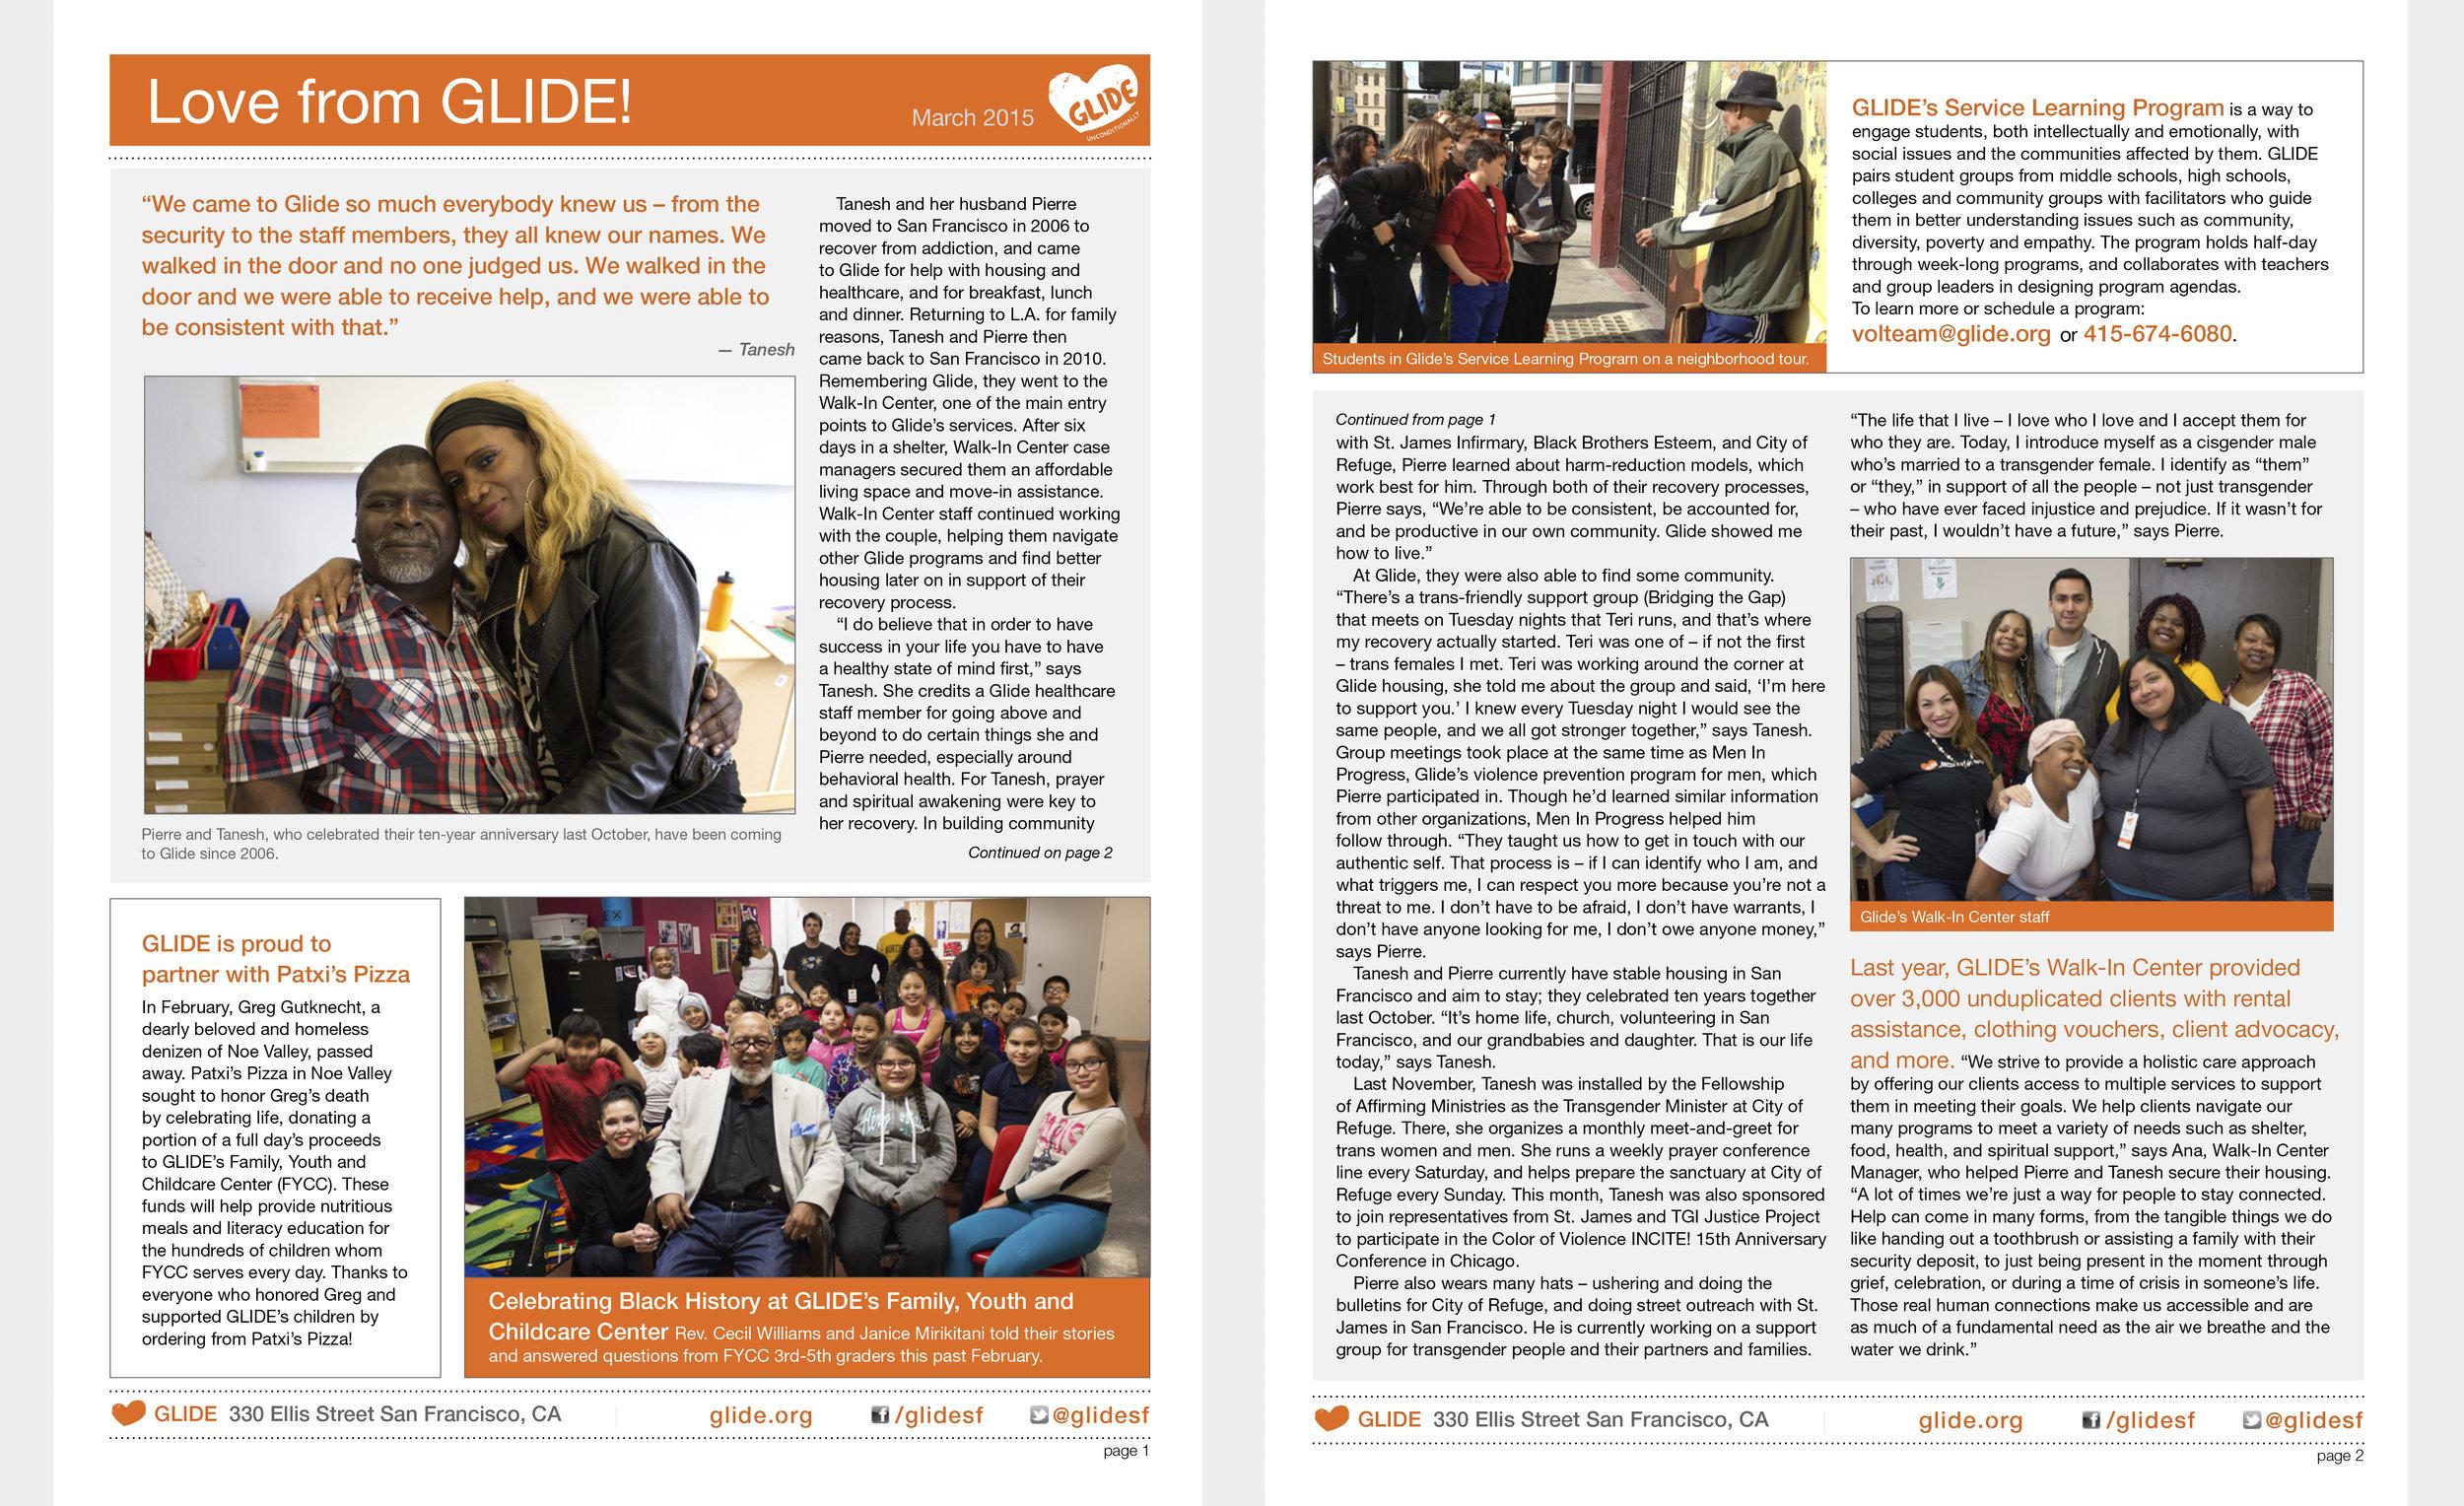 GLIDE_newsletters_01.jpg